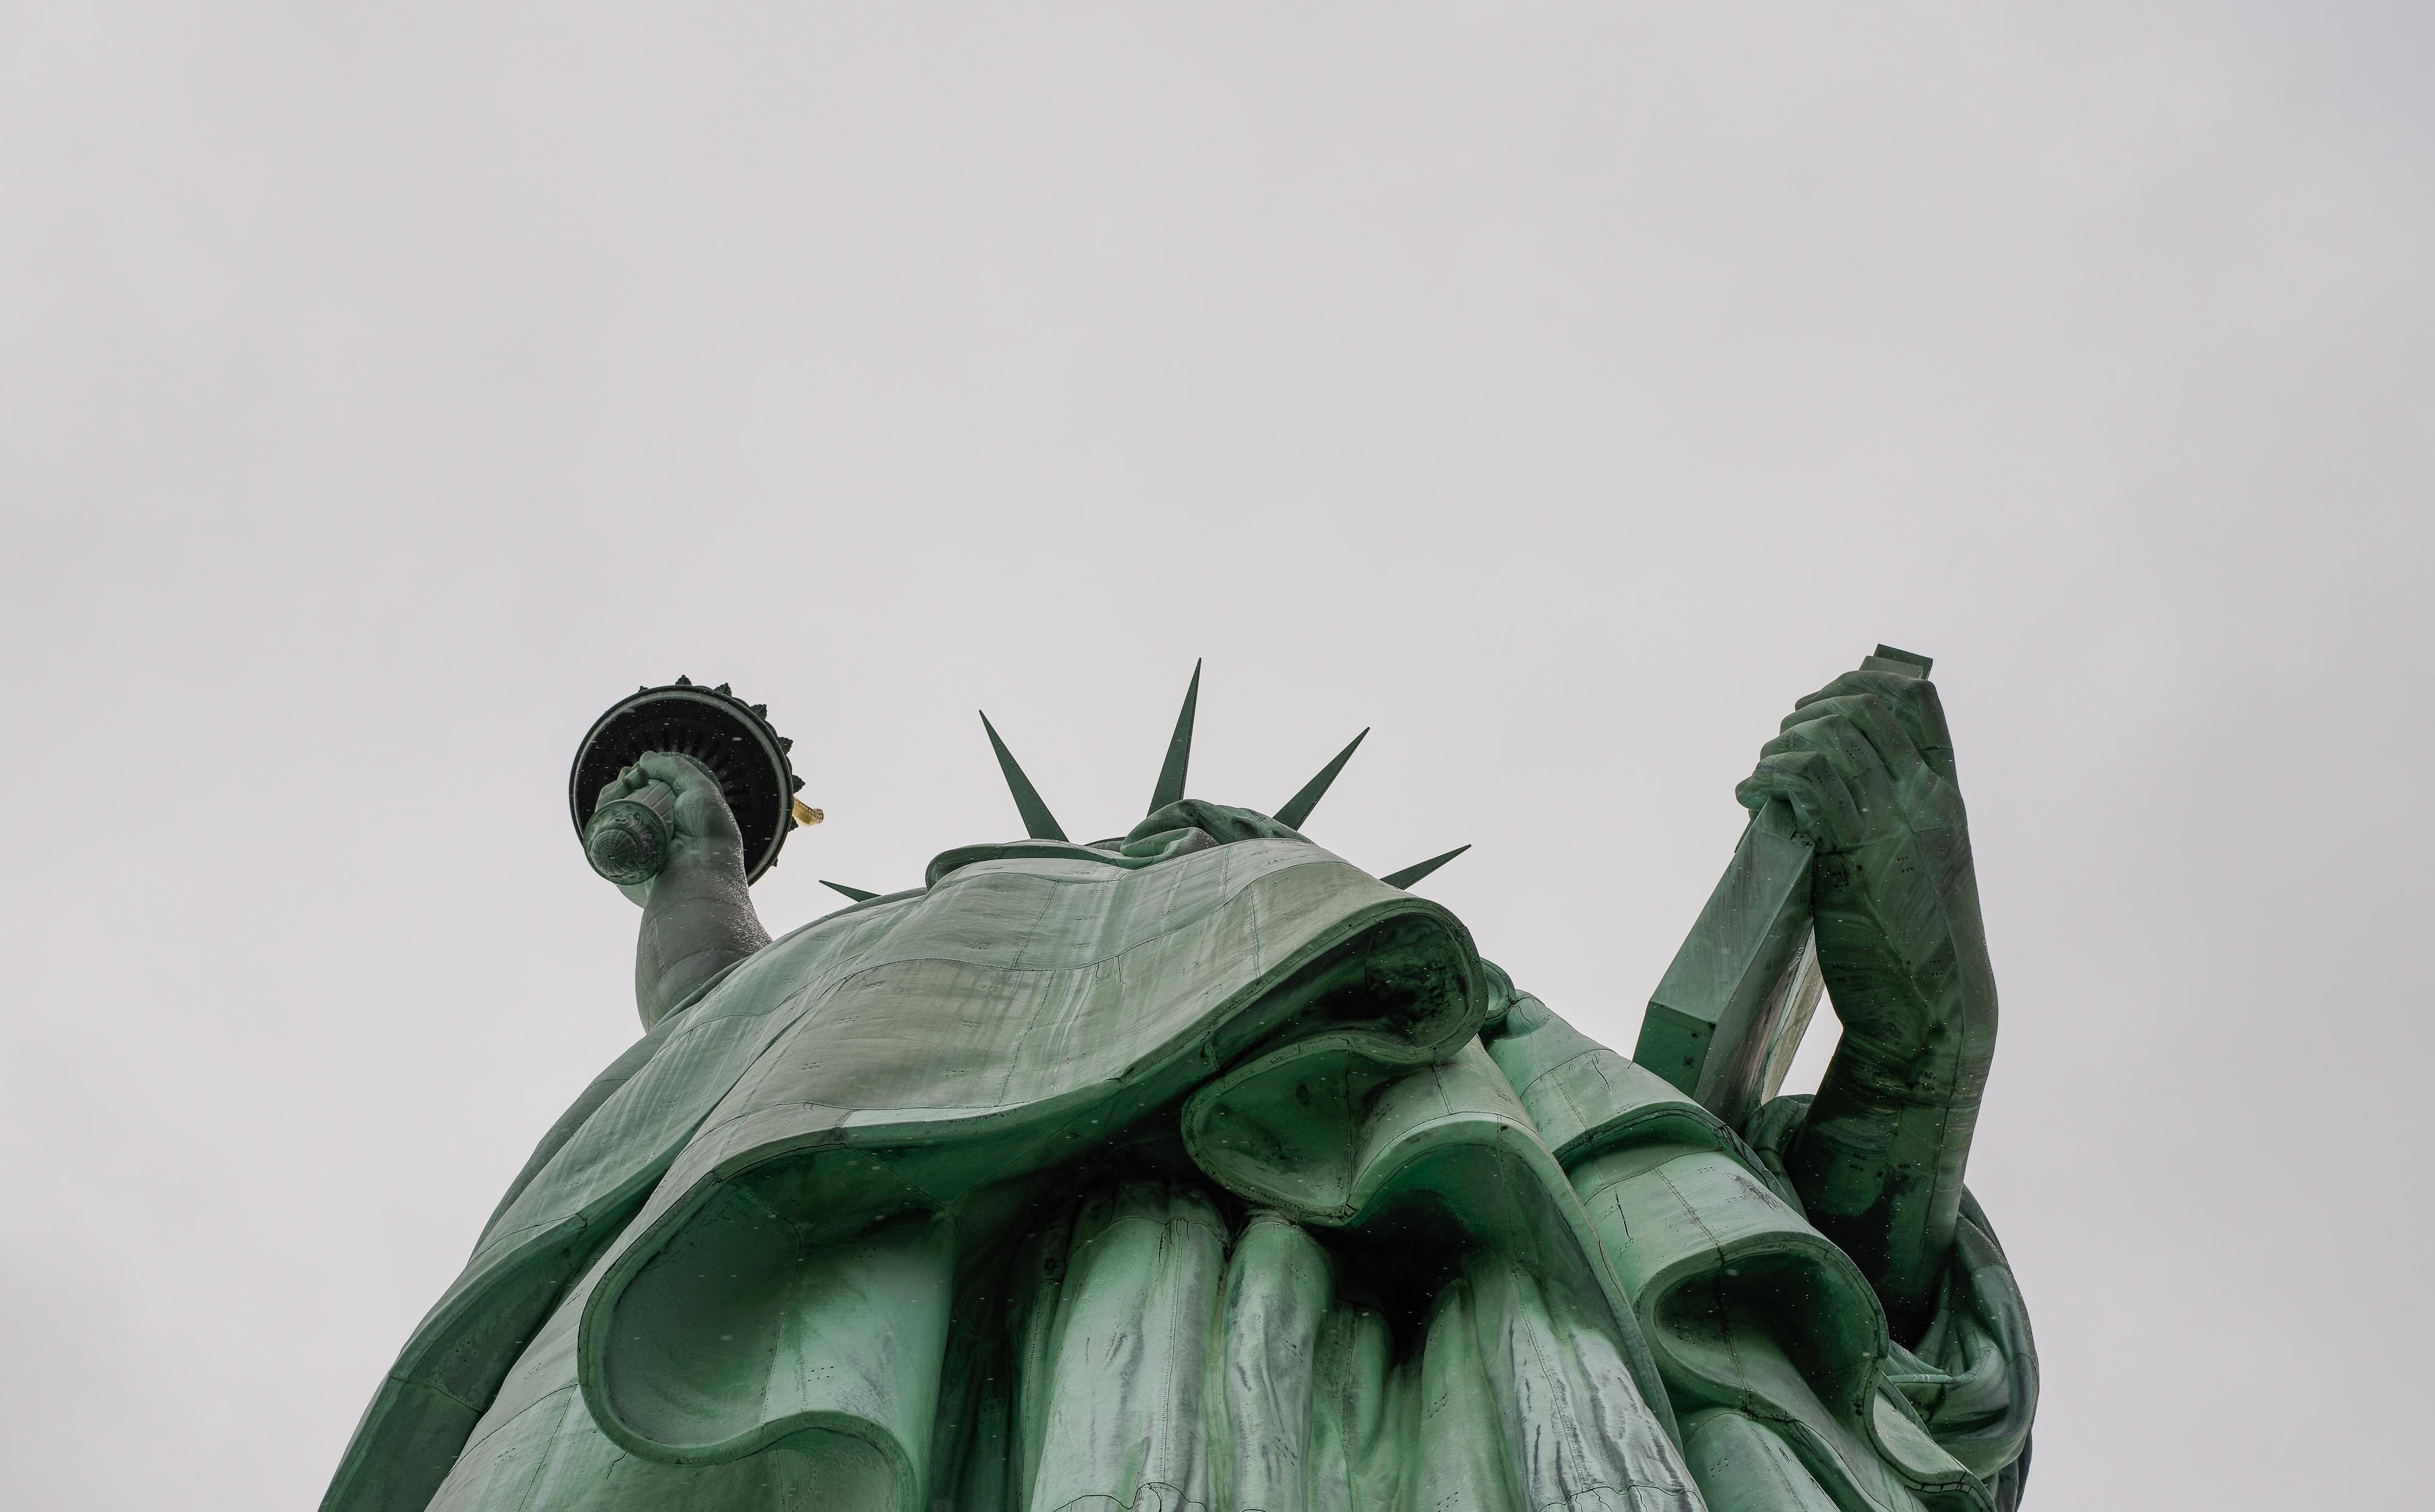 Free images new york manhattan monument green statue of new york manhattan monument statue green statue of liberty symbol color usa america landmark freedom tourism biocorpaavc